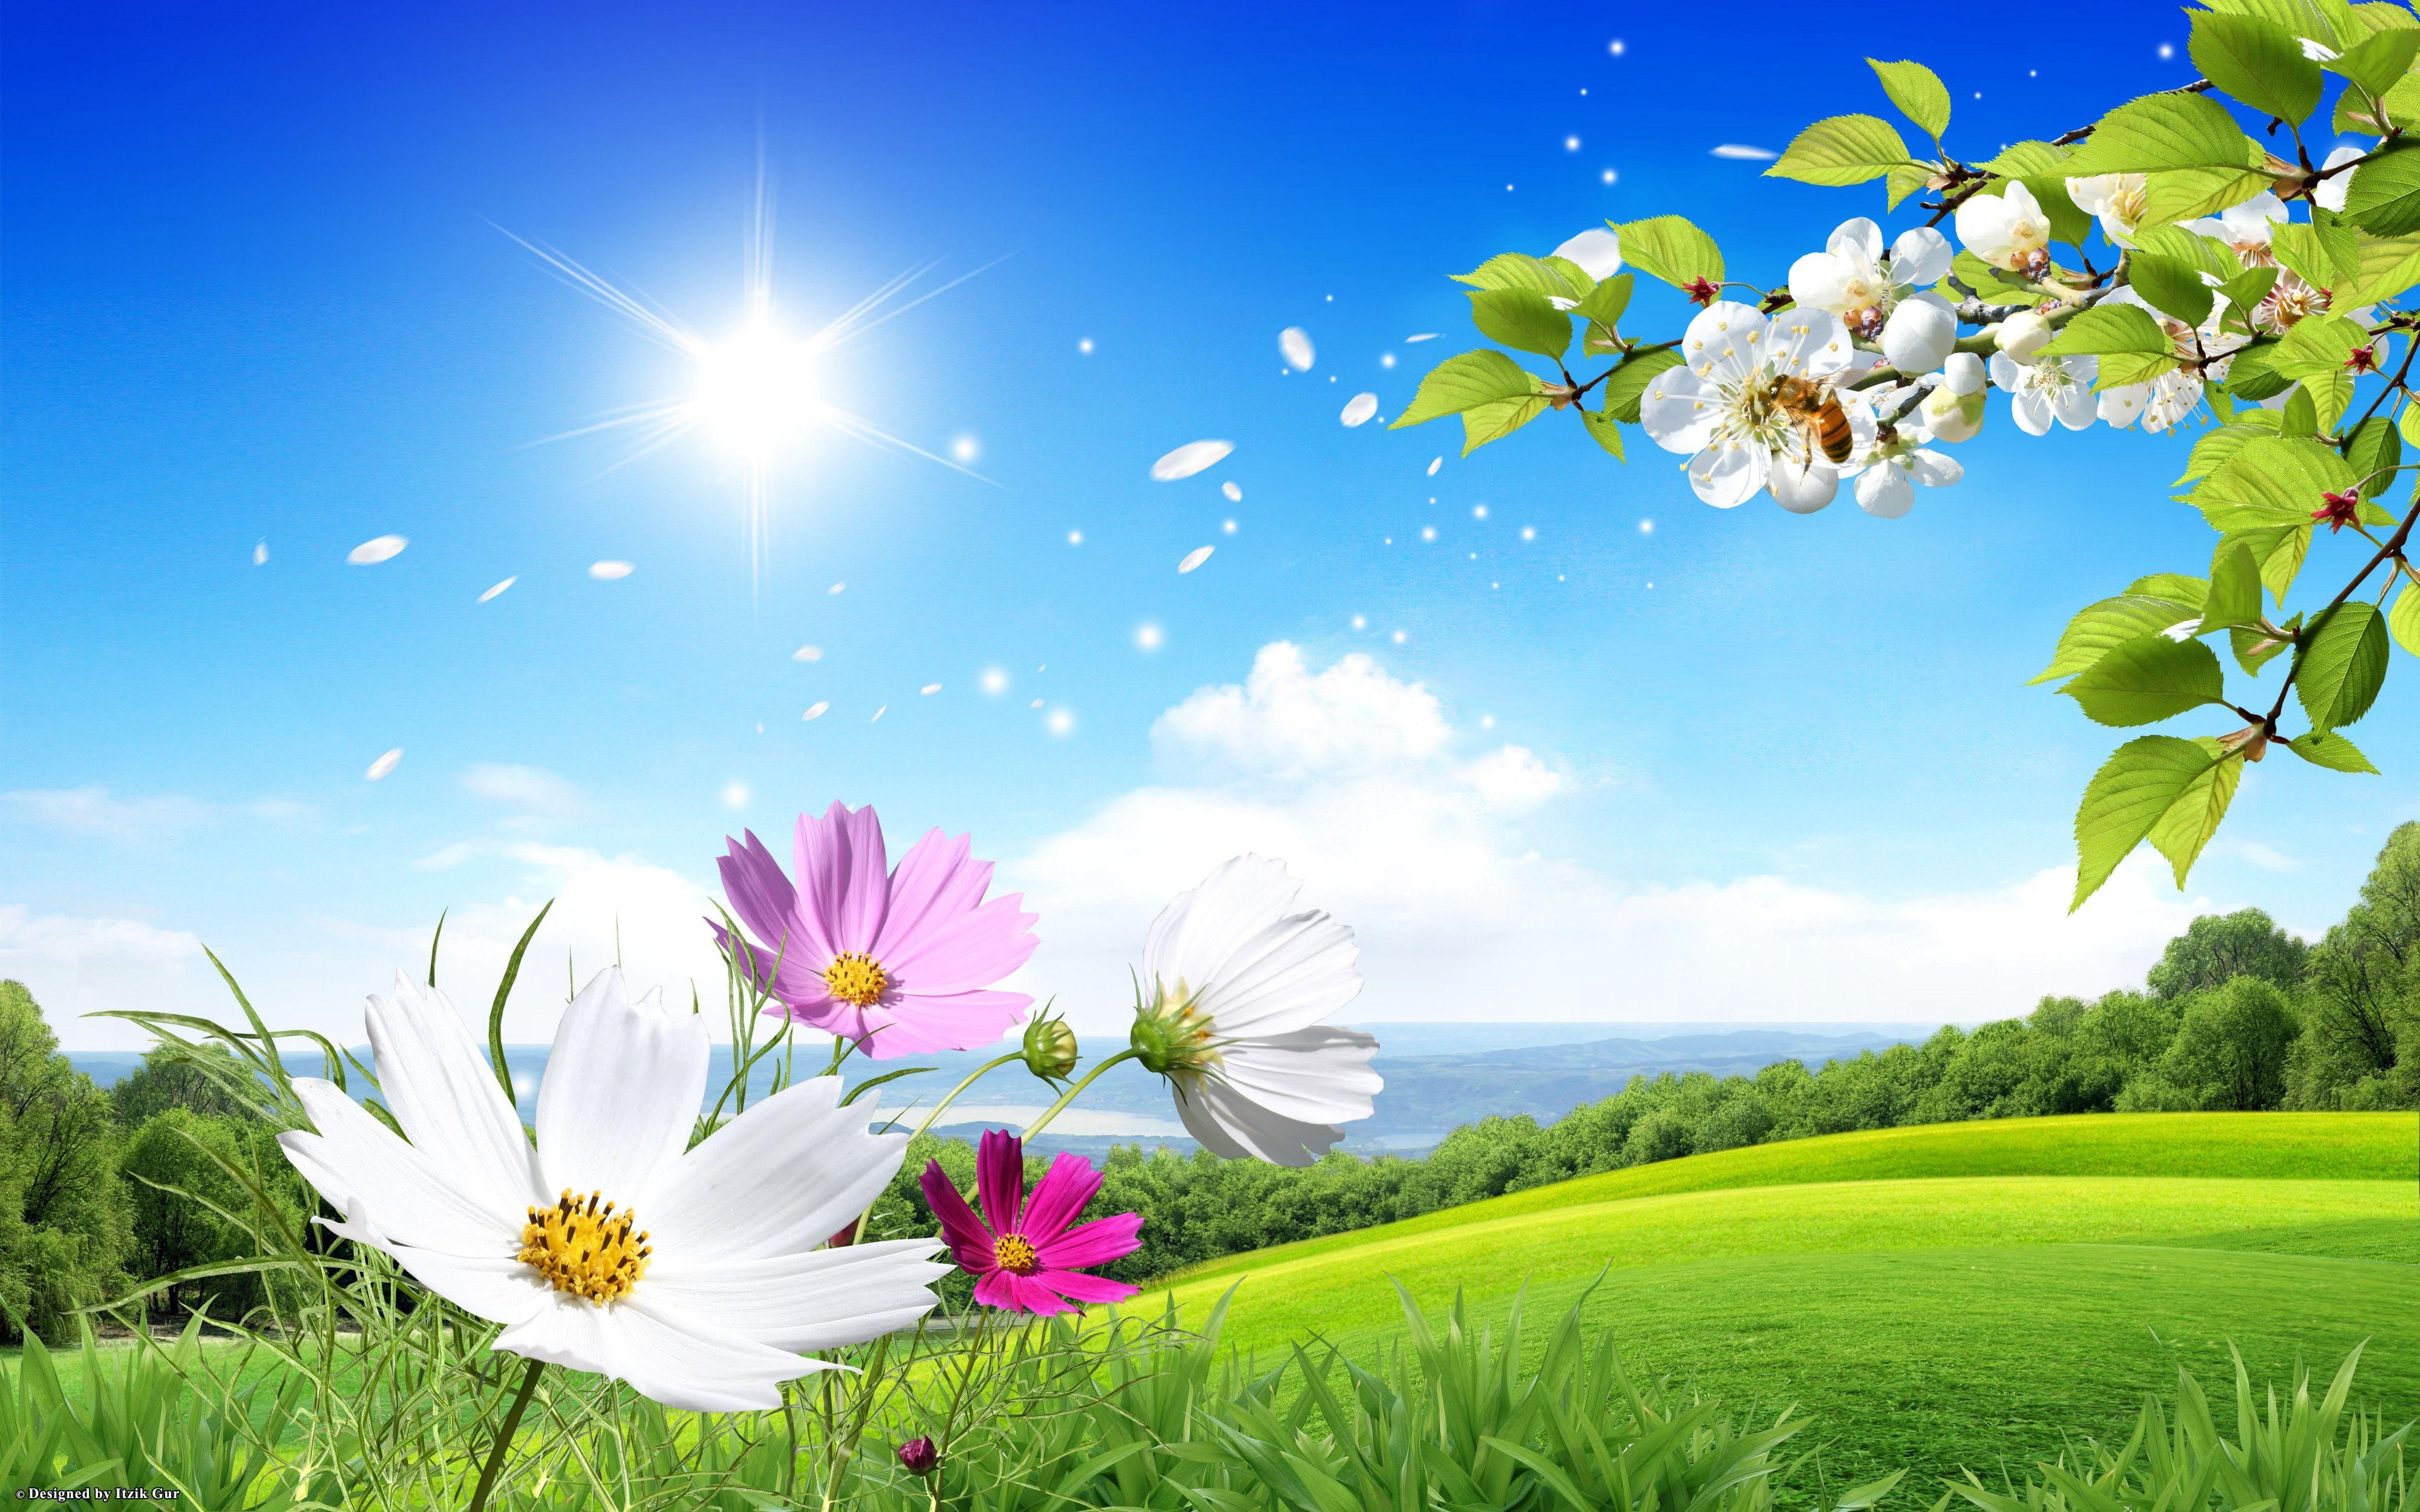 Download Free Wallpapers Online Beautiful Summer Wallpaper Scenery Wallpaper Spring Wallpaper